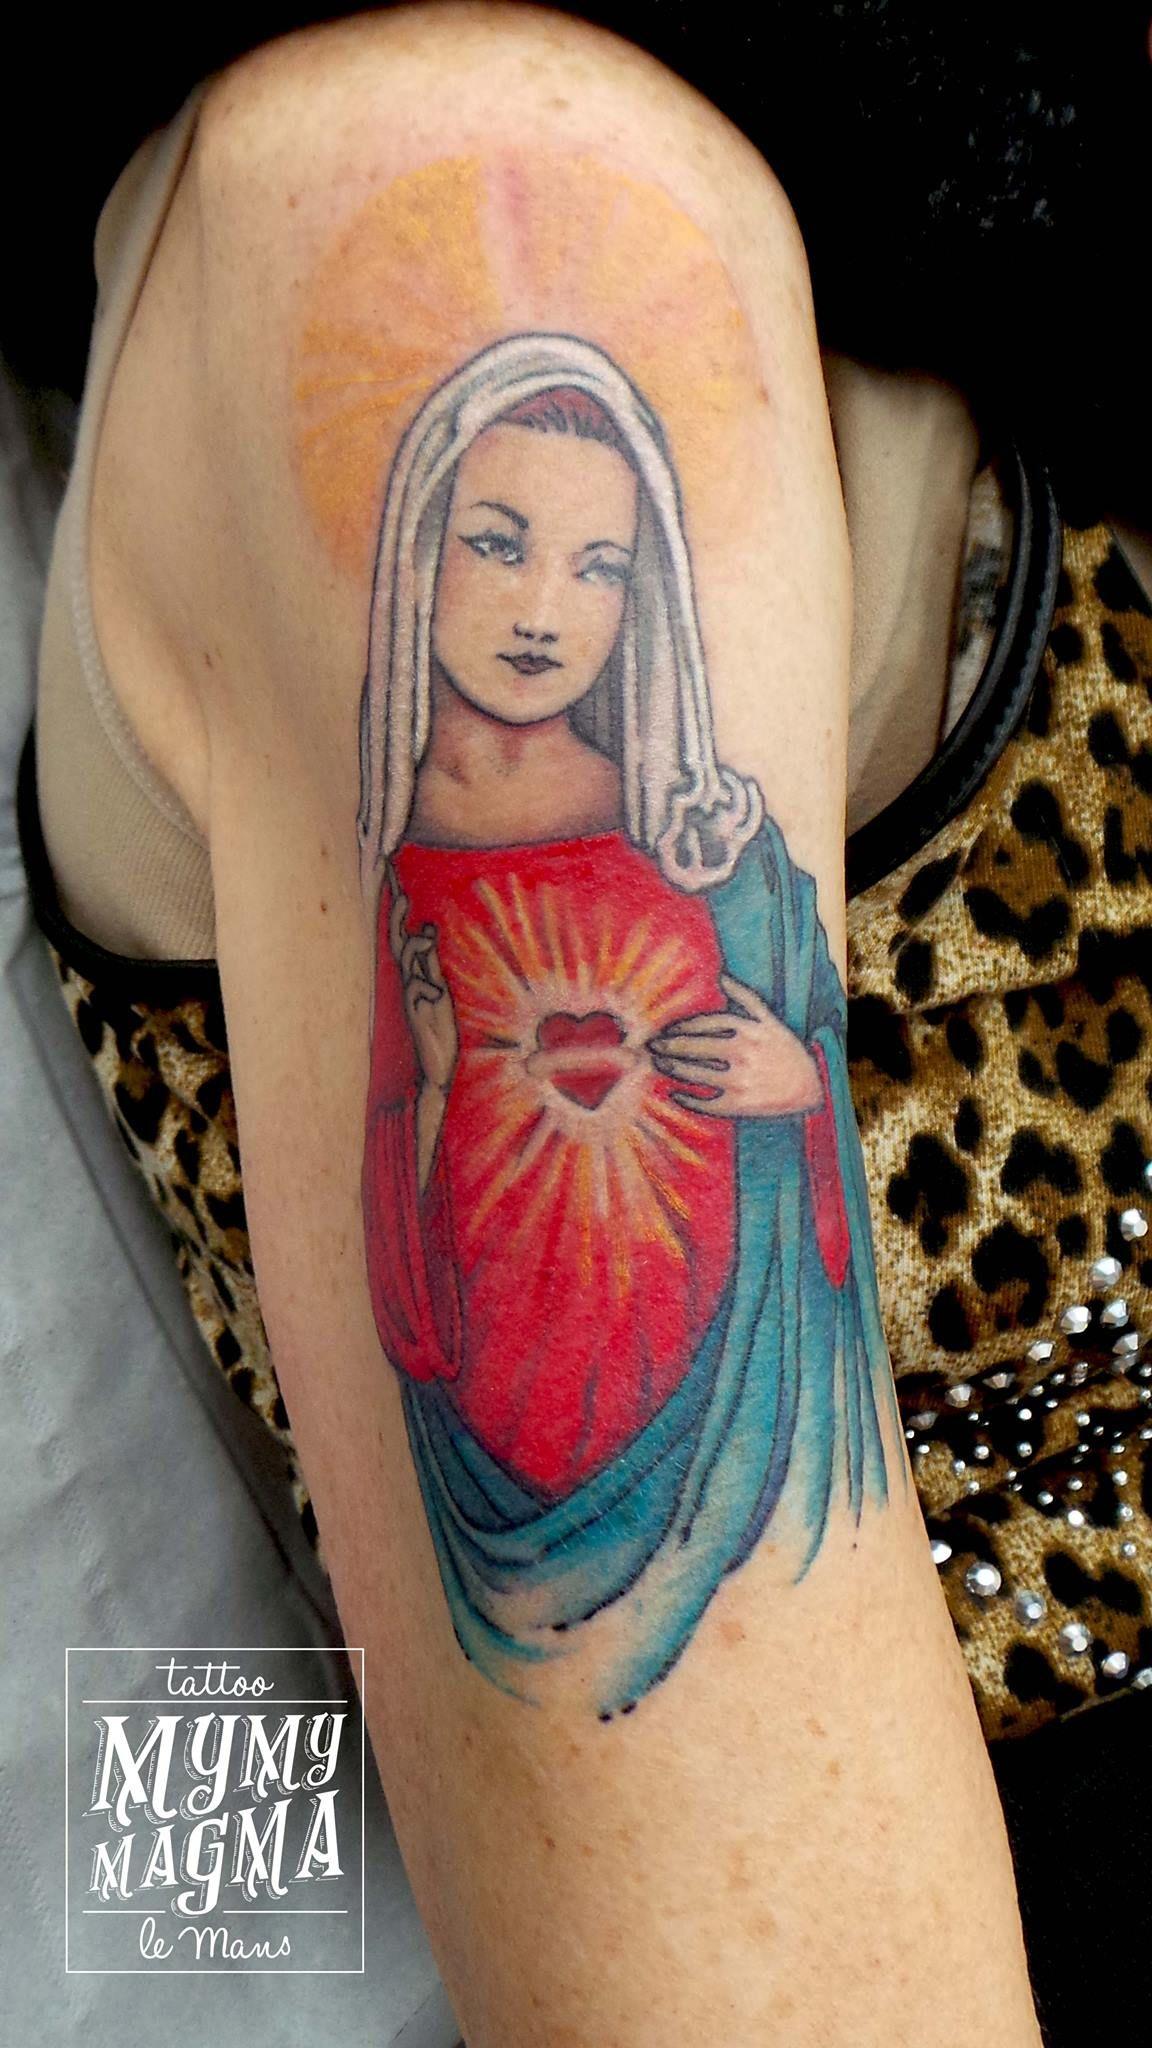 Tatouage Vierge Coloree Mymymagma Tattoo Tatouagelemans Tattoo